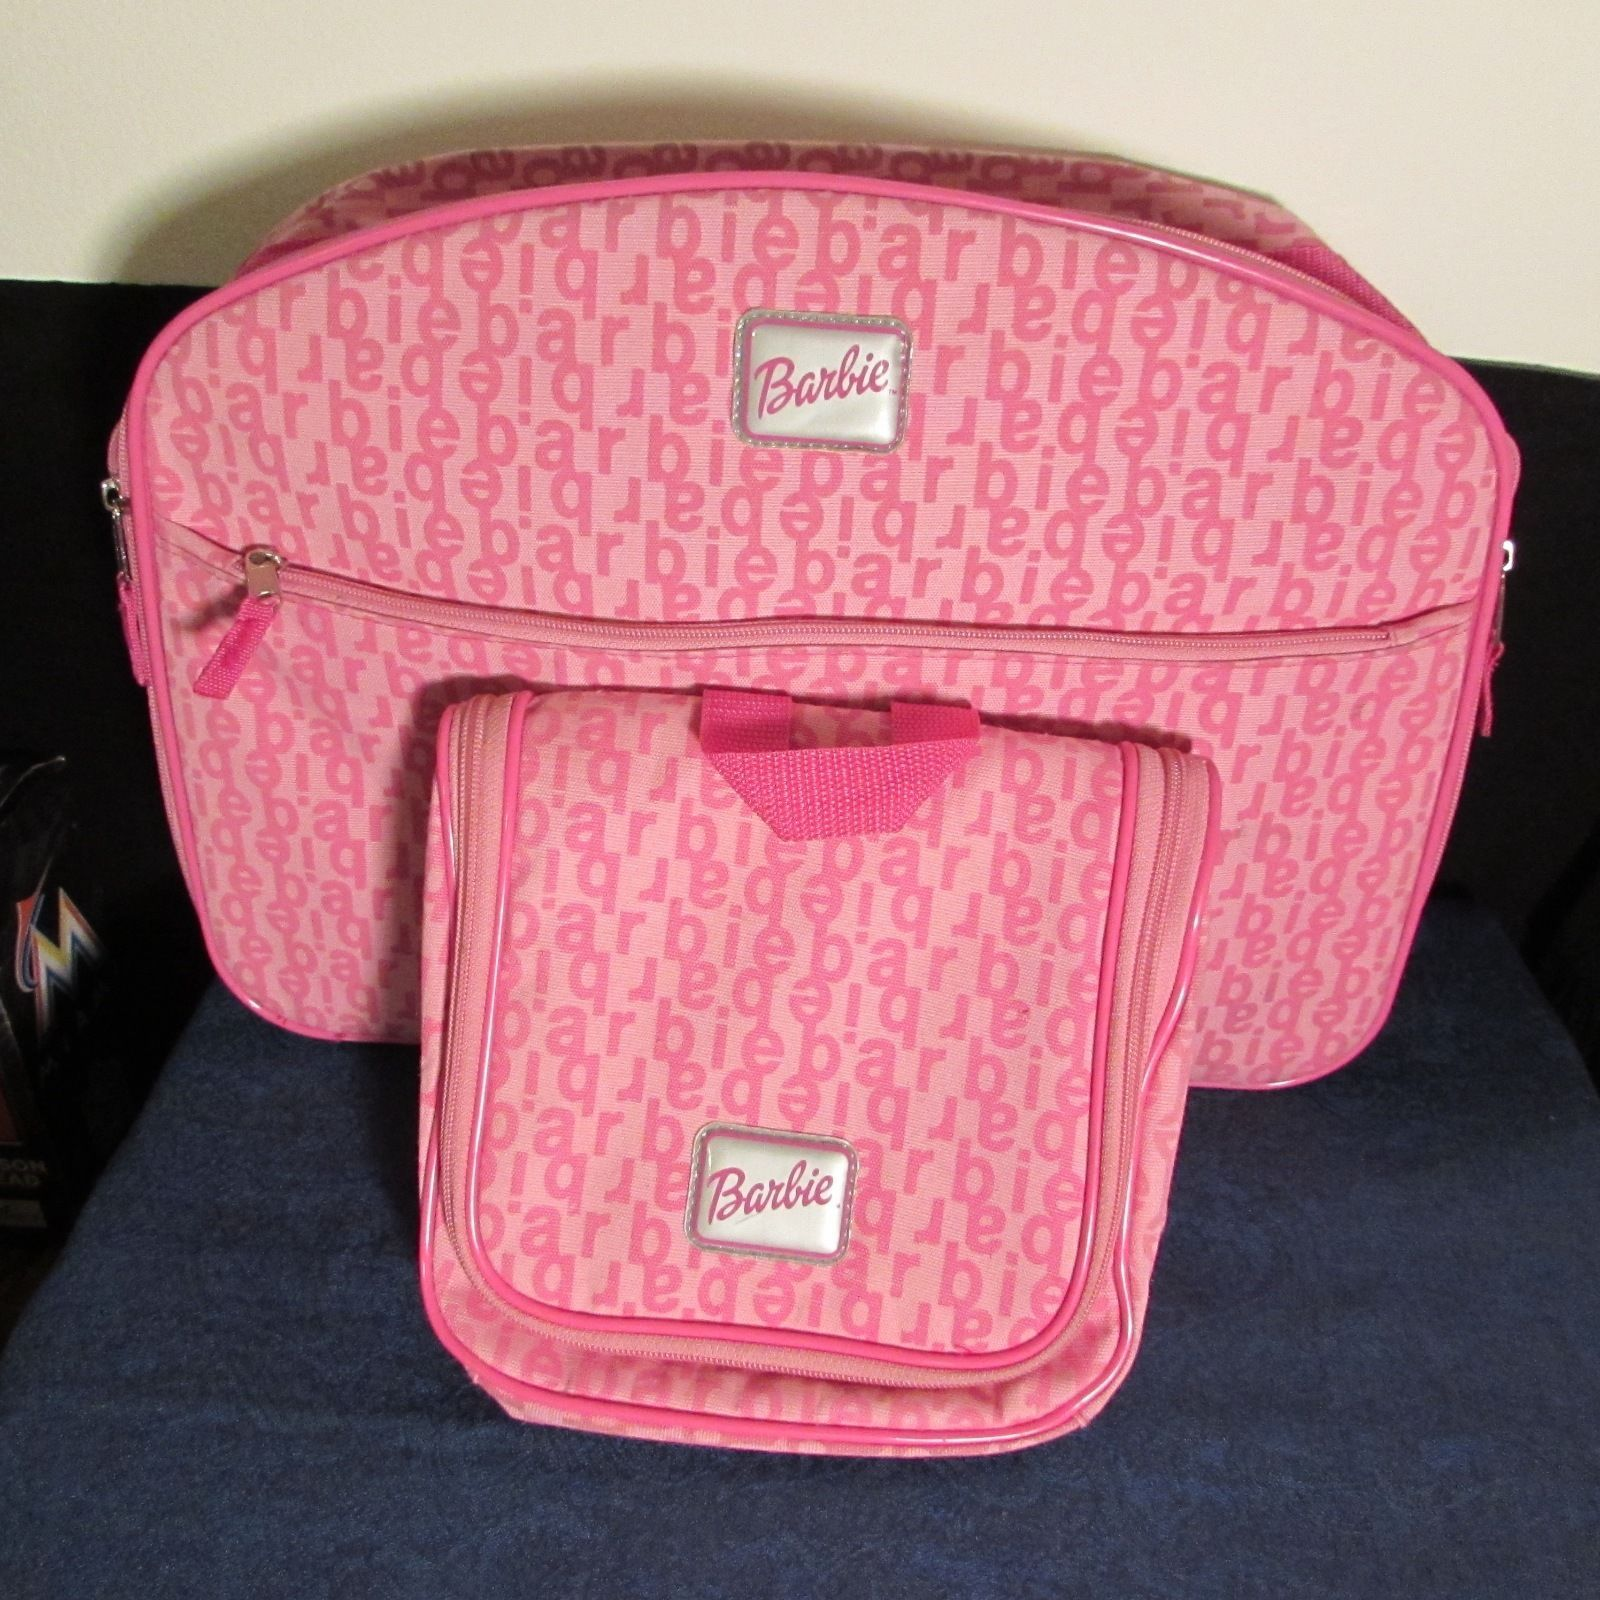 Barbie Girls Pink Zipper Soft Weekener/Suitcase & Beauty Travel Organizer Set